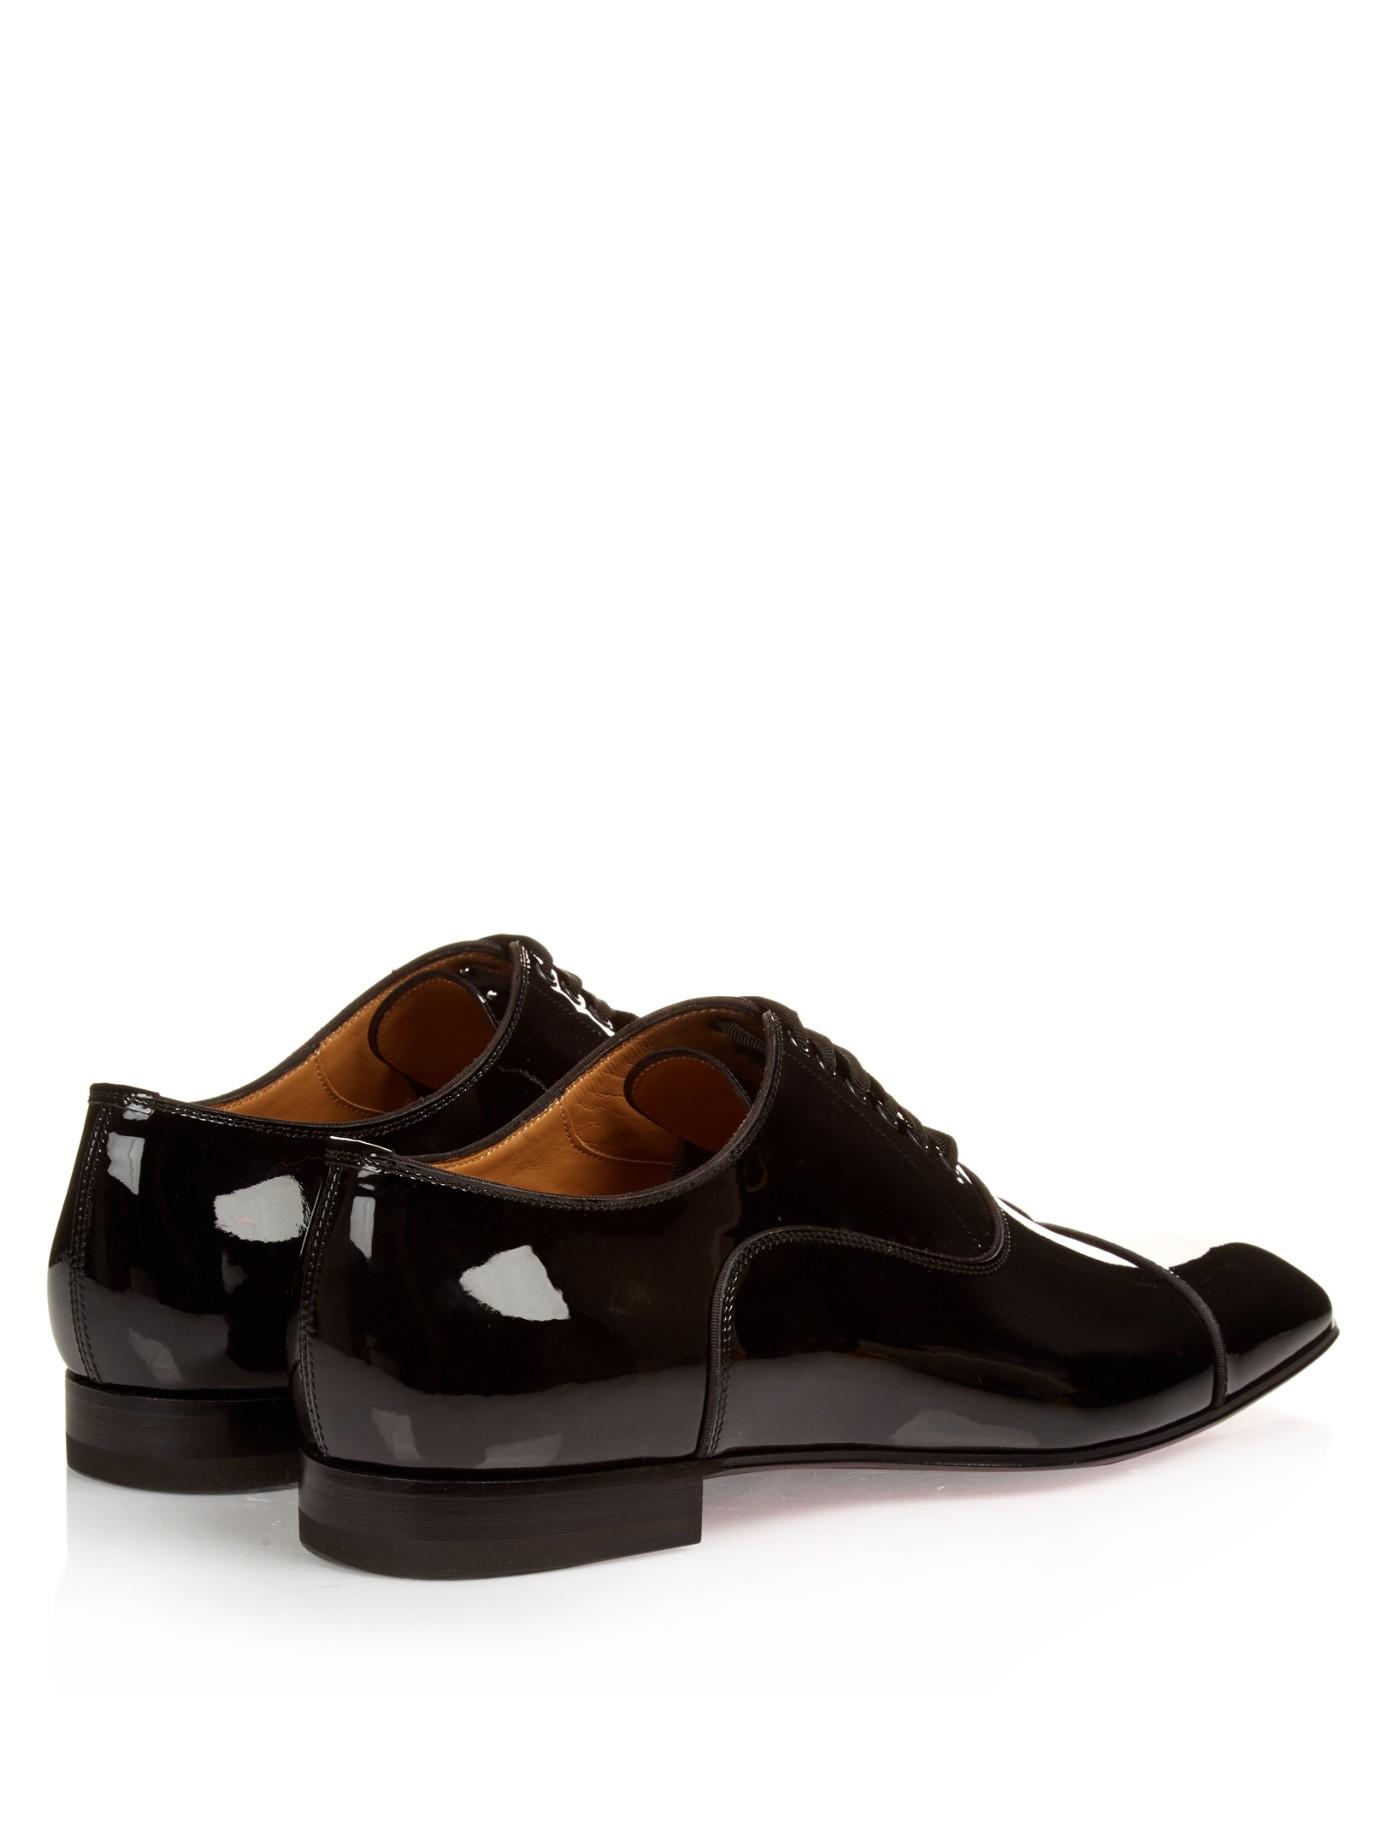 christian louboutin lace square-toe slippers